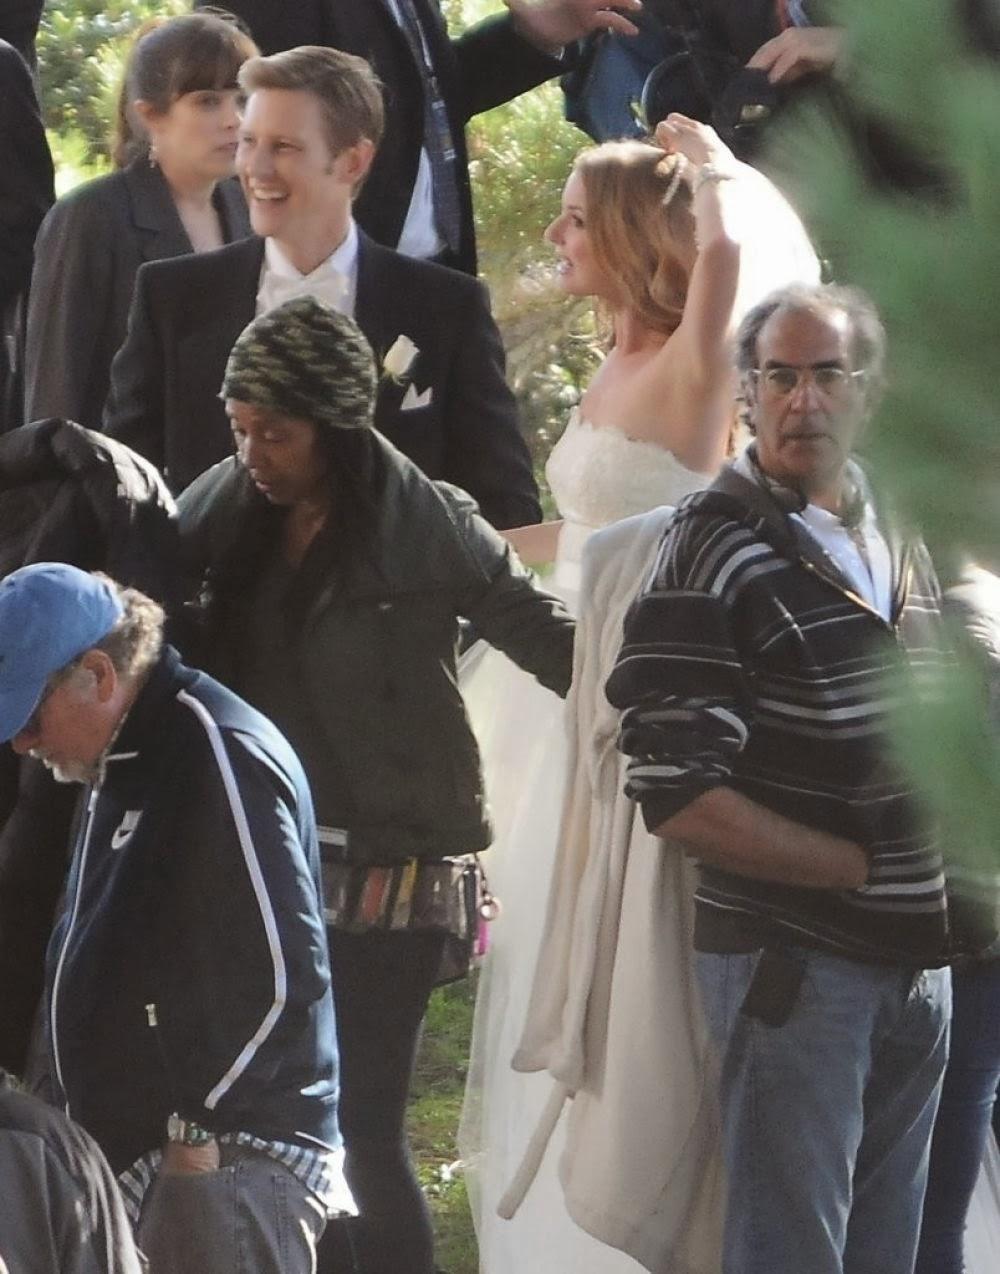 Emily vancamp photos in wedding dress on the set of revenge in palos verdes